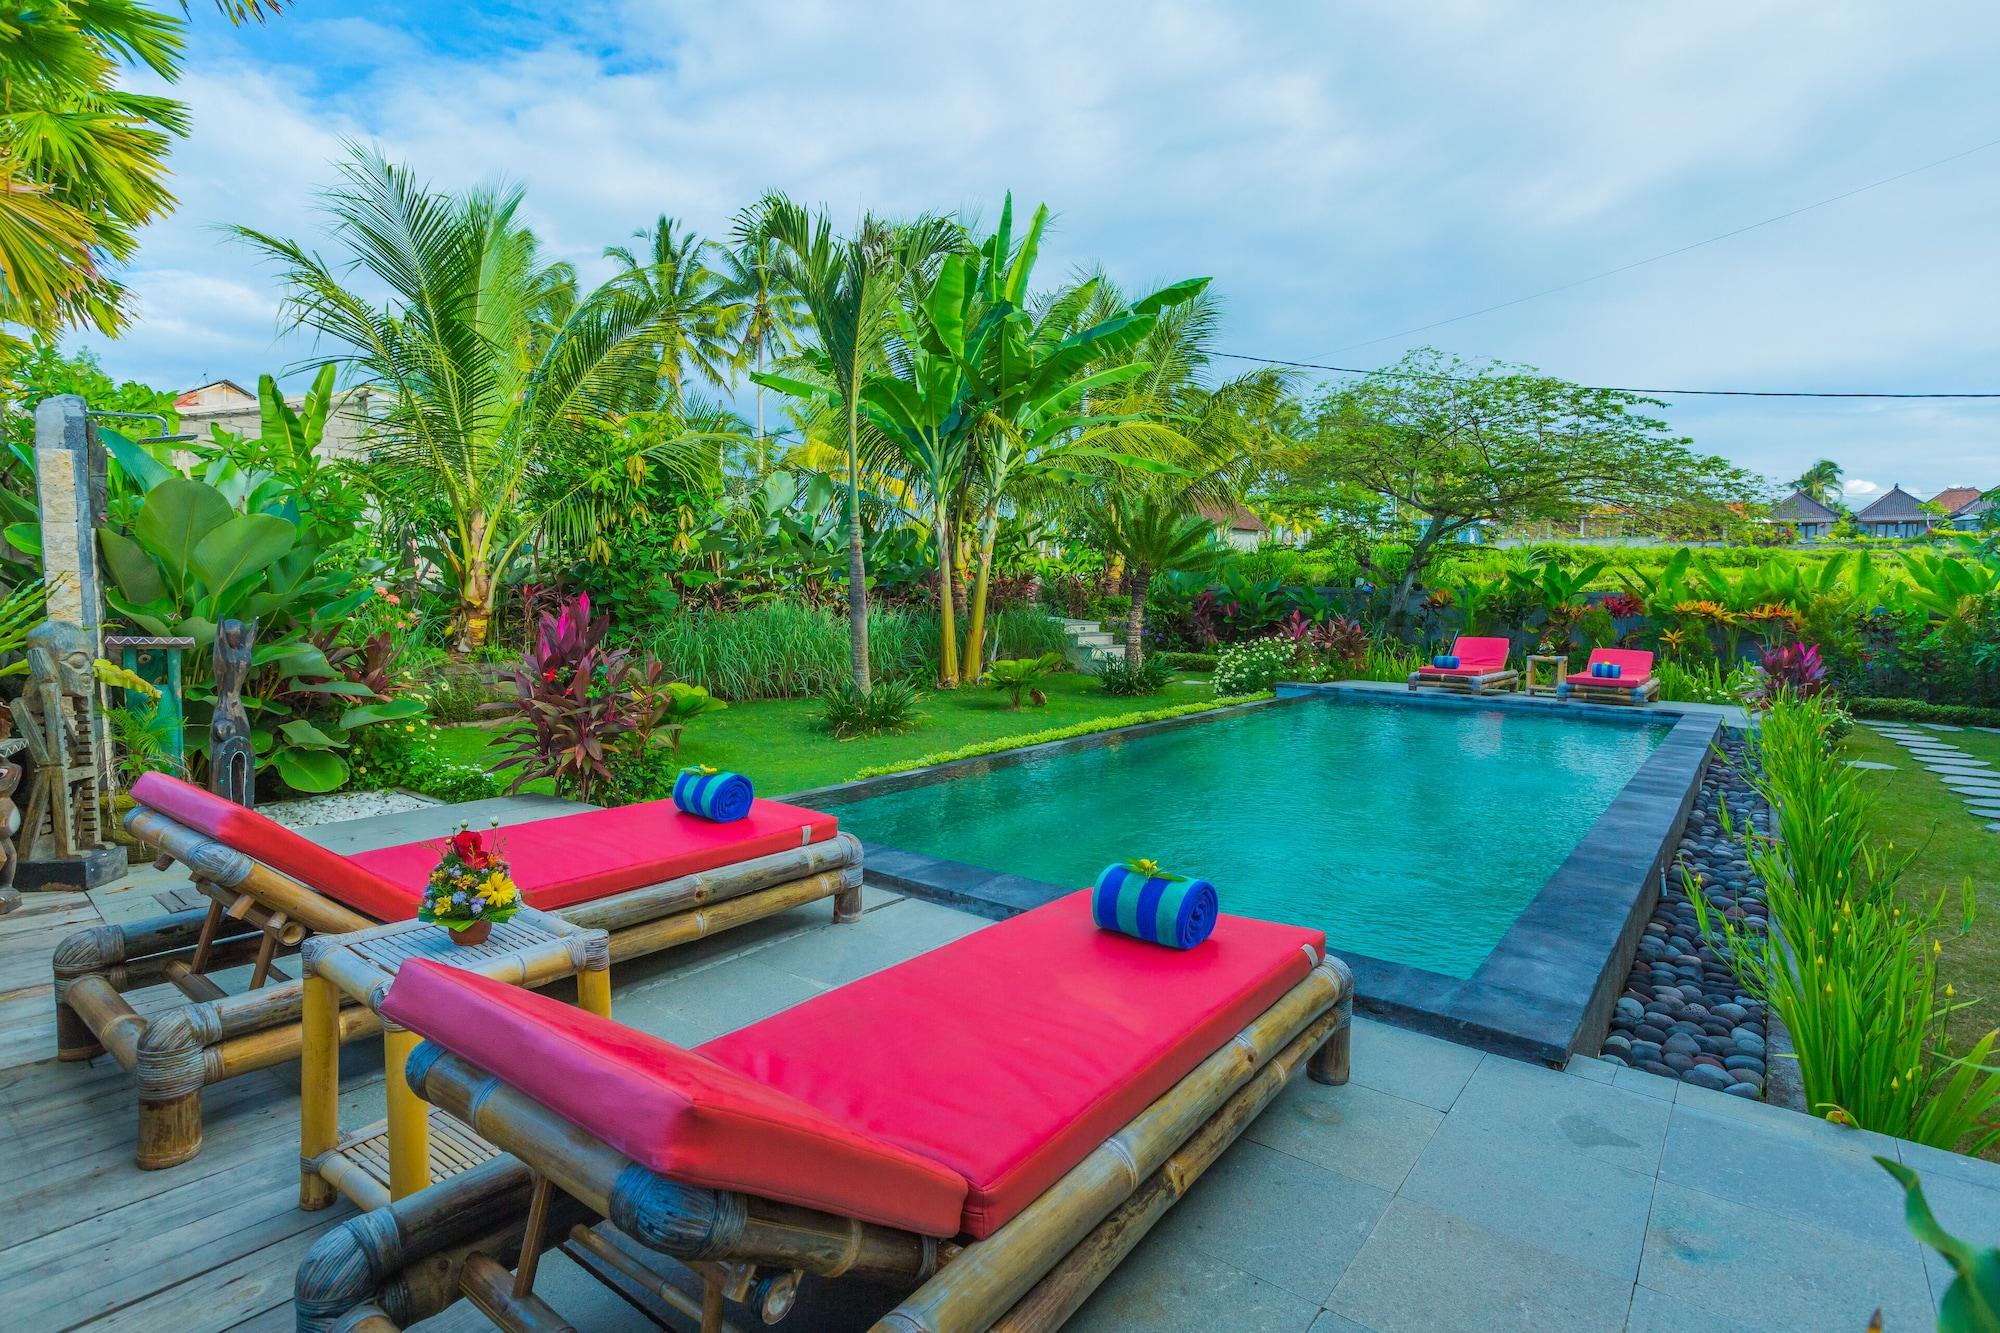 Tantra Guesthouse Ubud, Gianyar